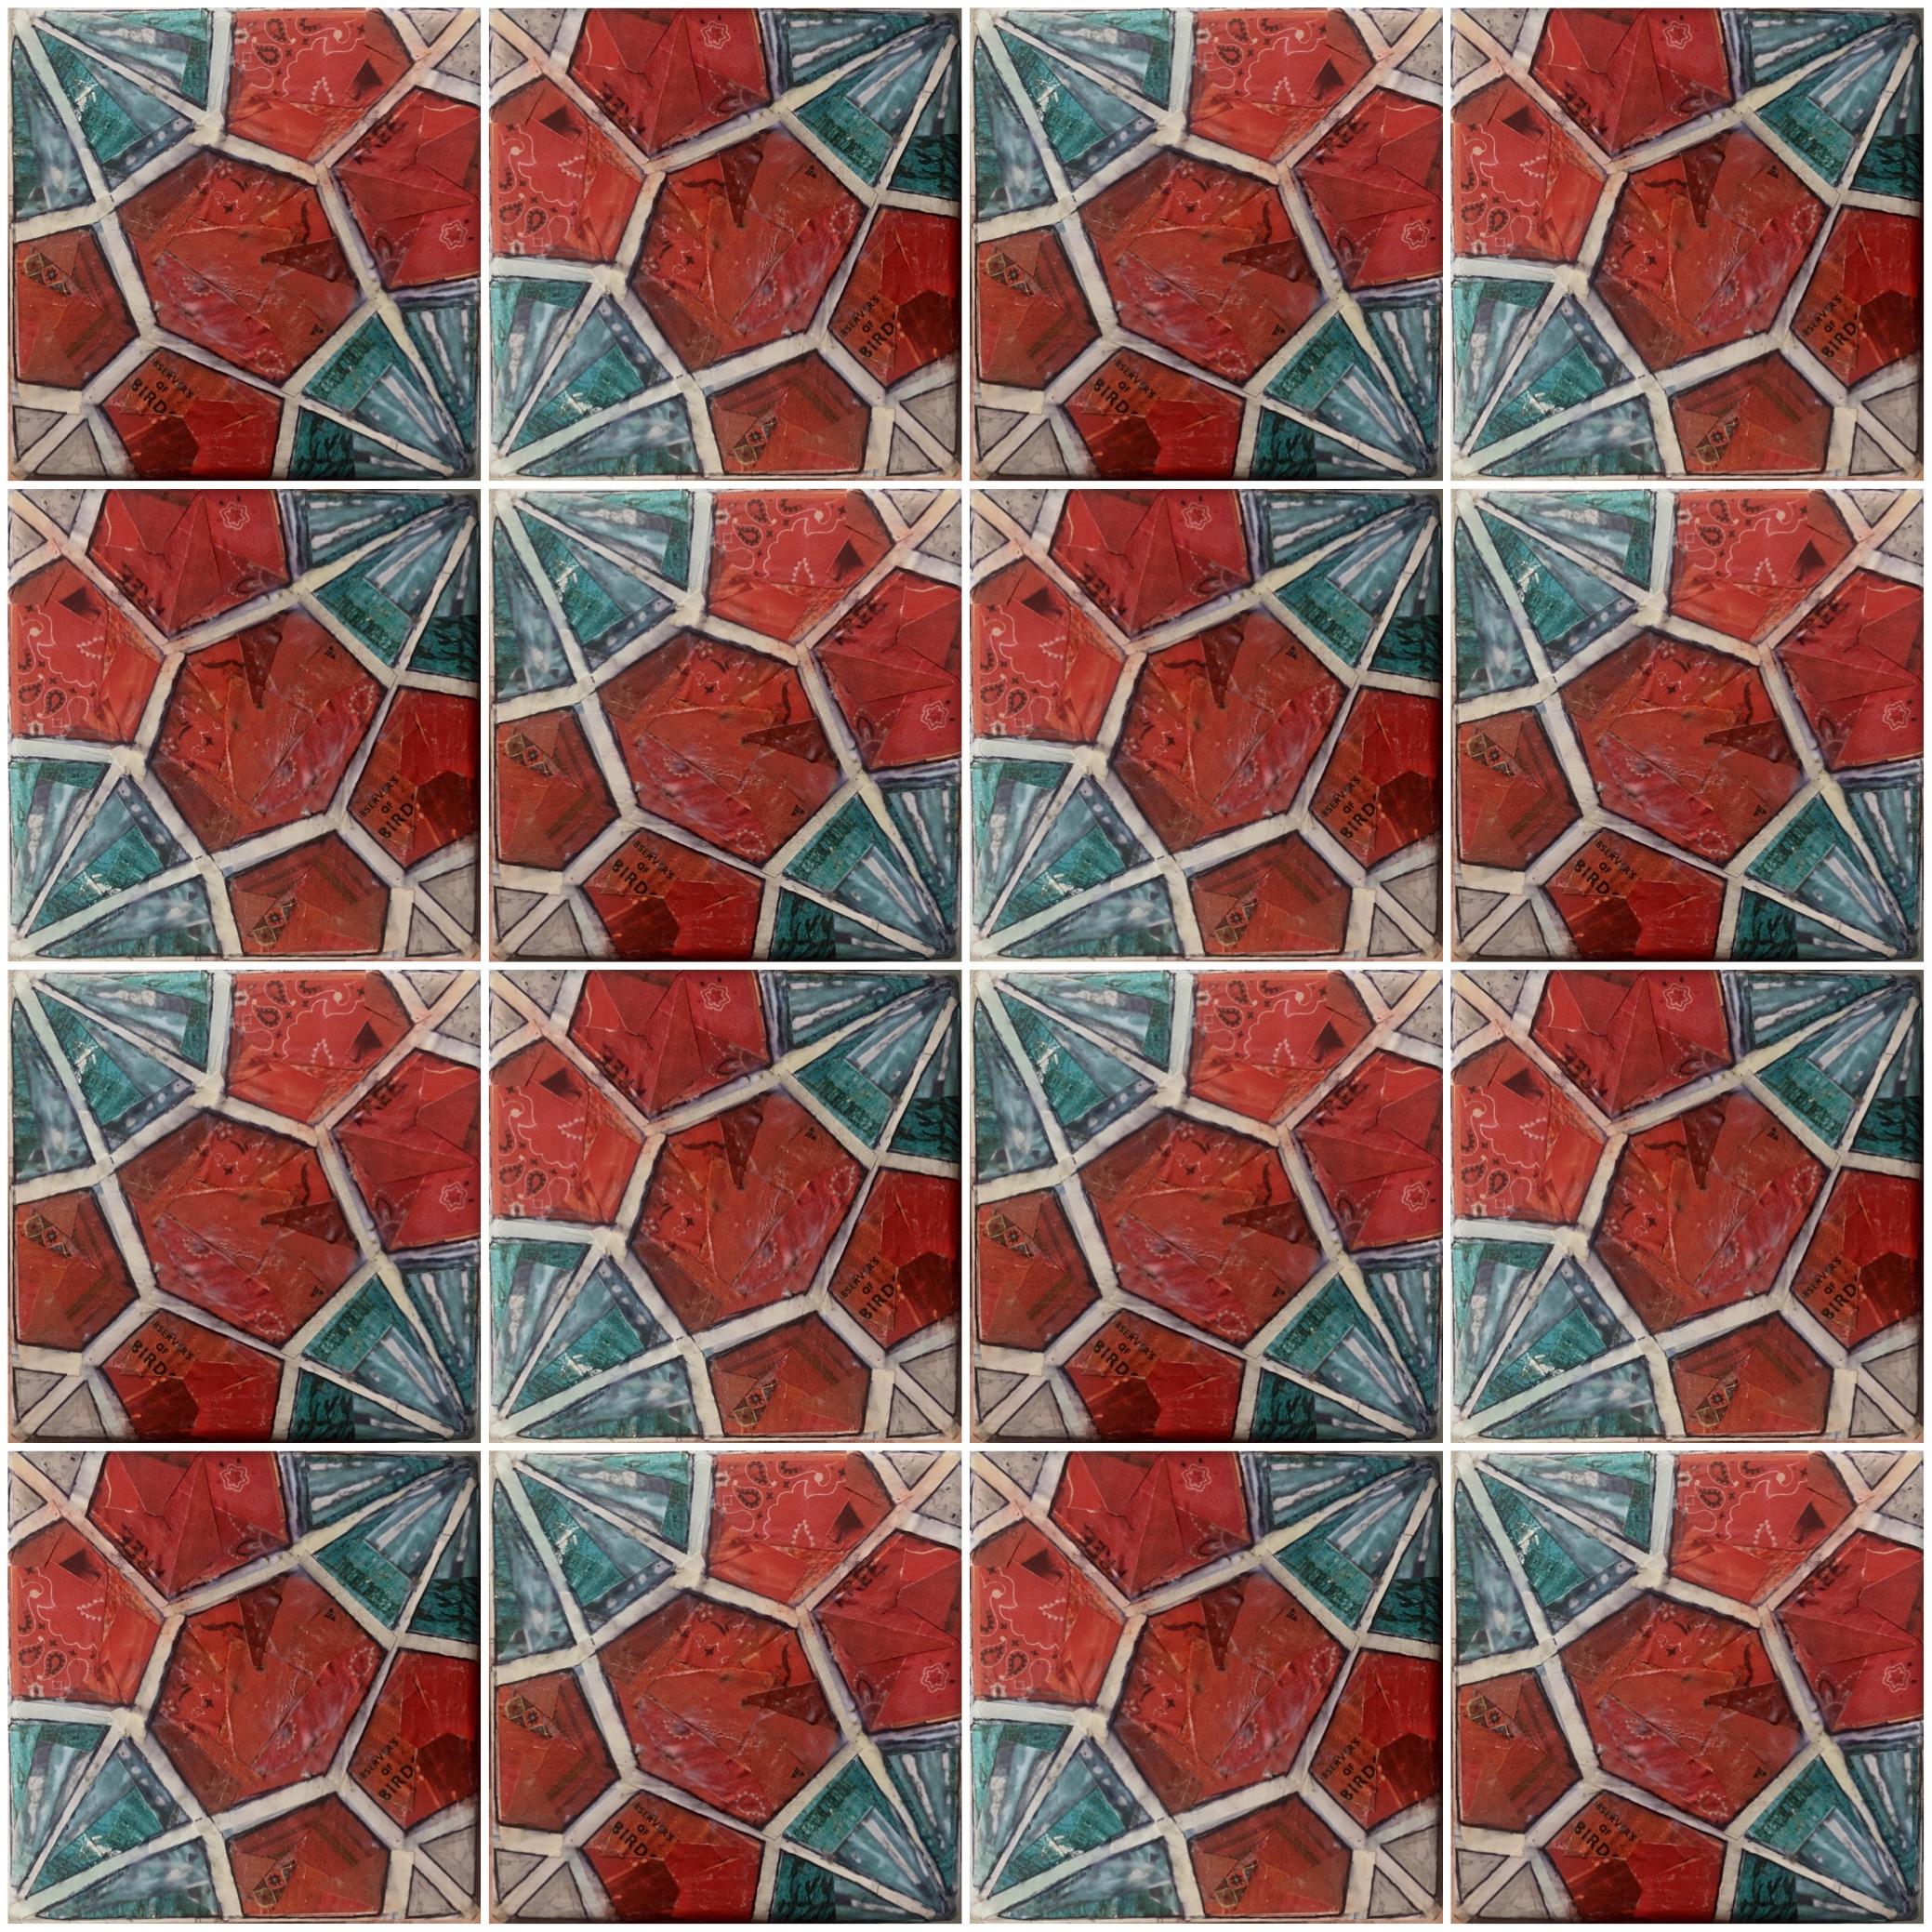 red turq floral tile.JPG